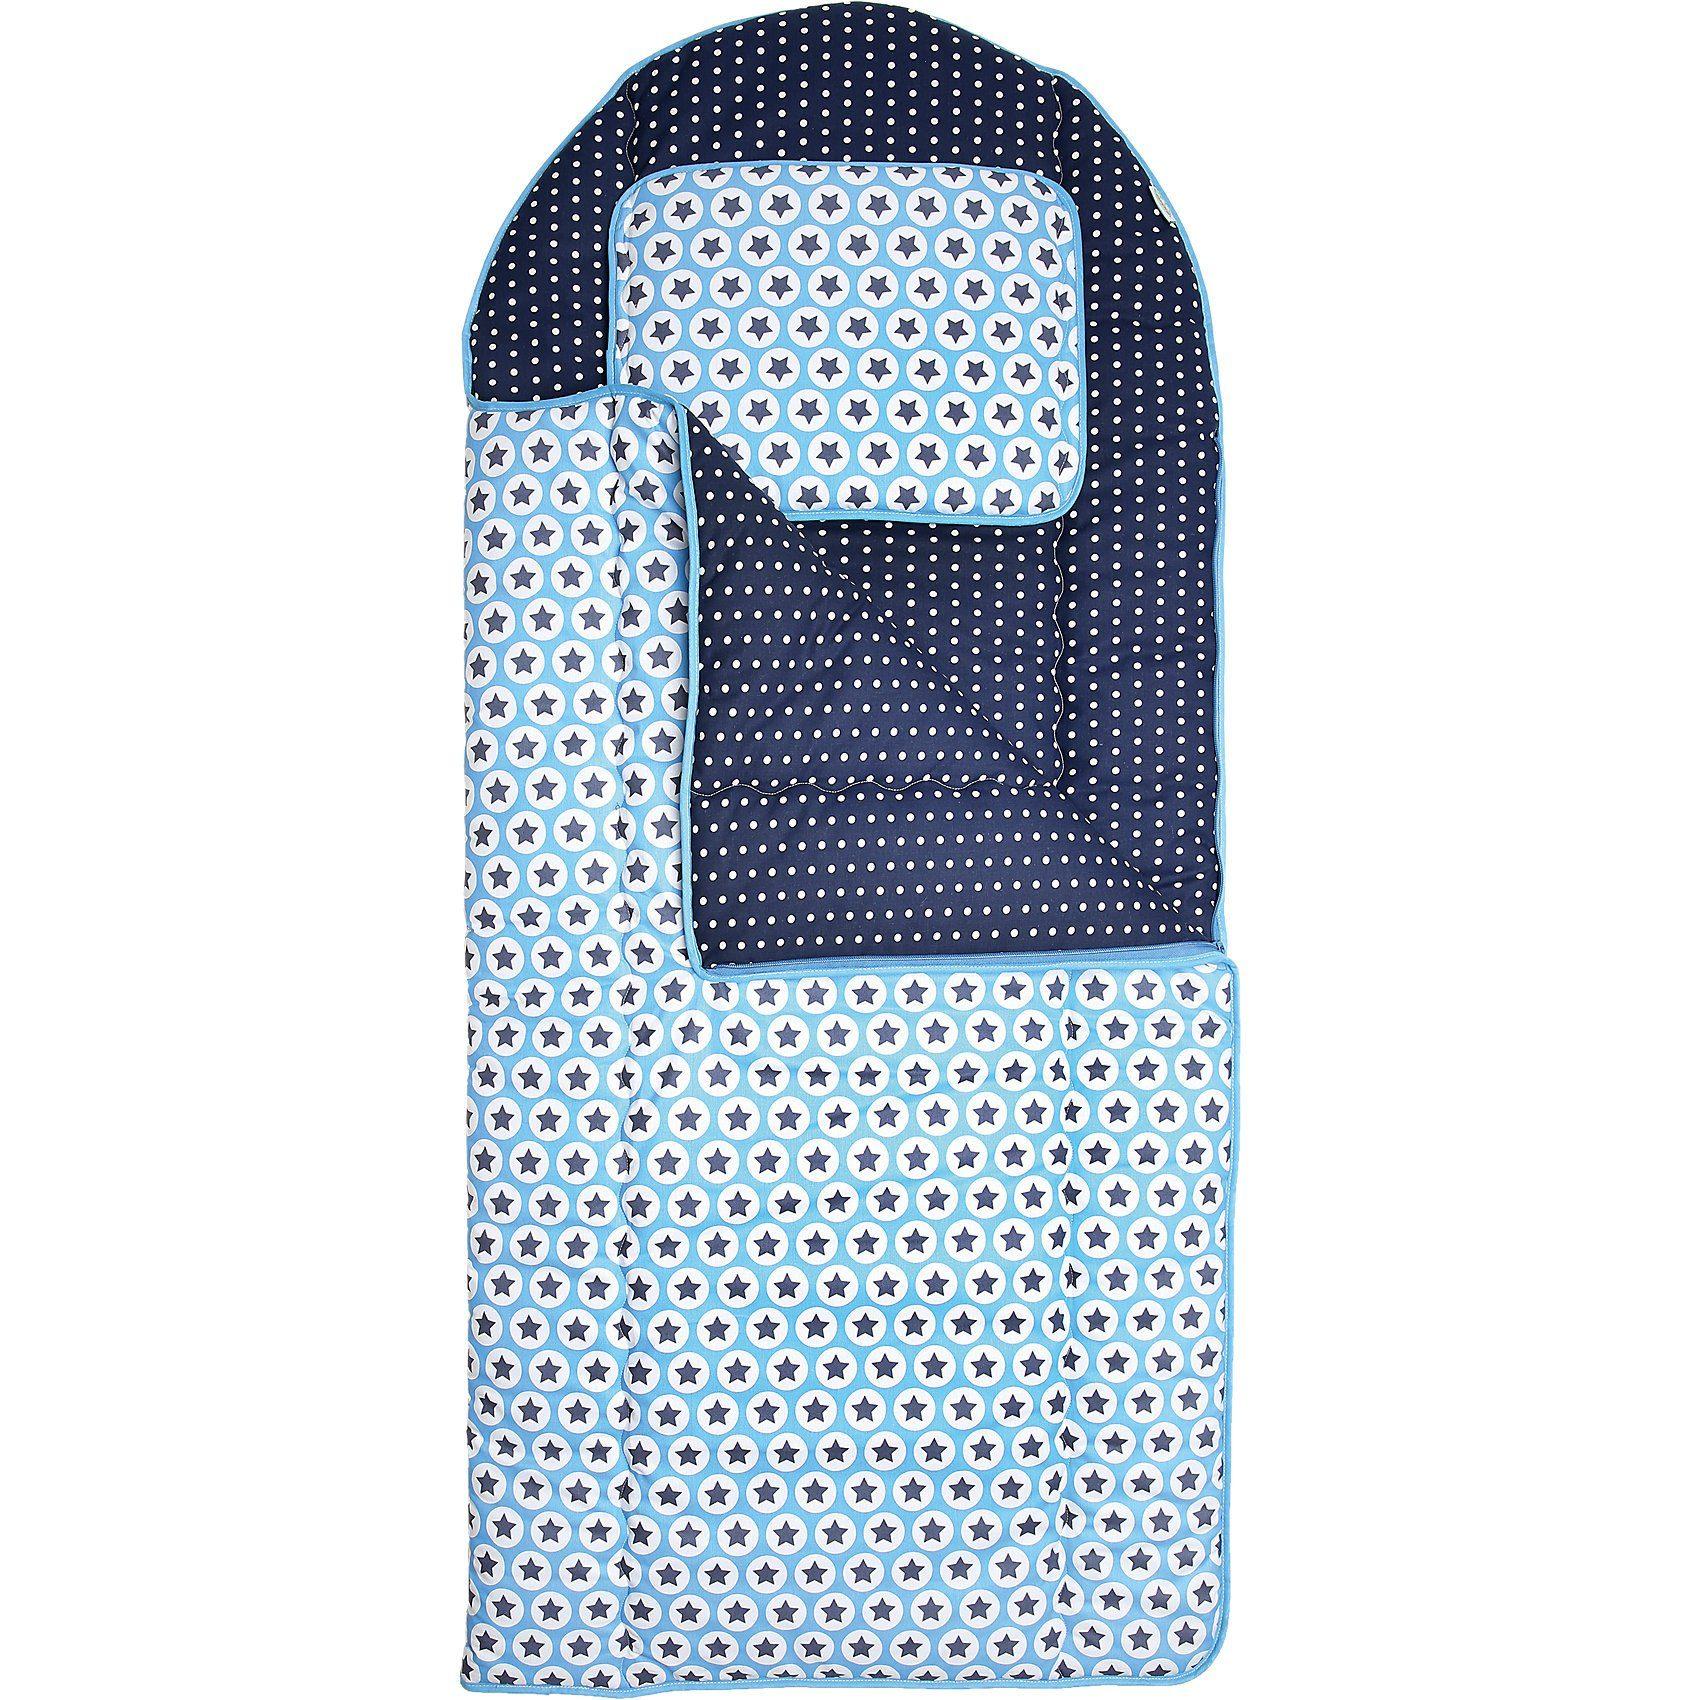 Odenwälder Kinderschlafsack Sterne, 140 cm, blau